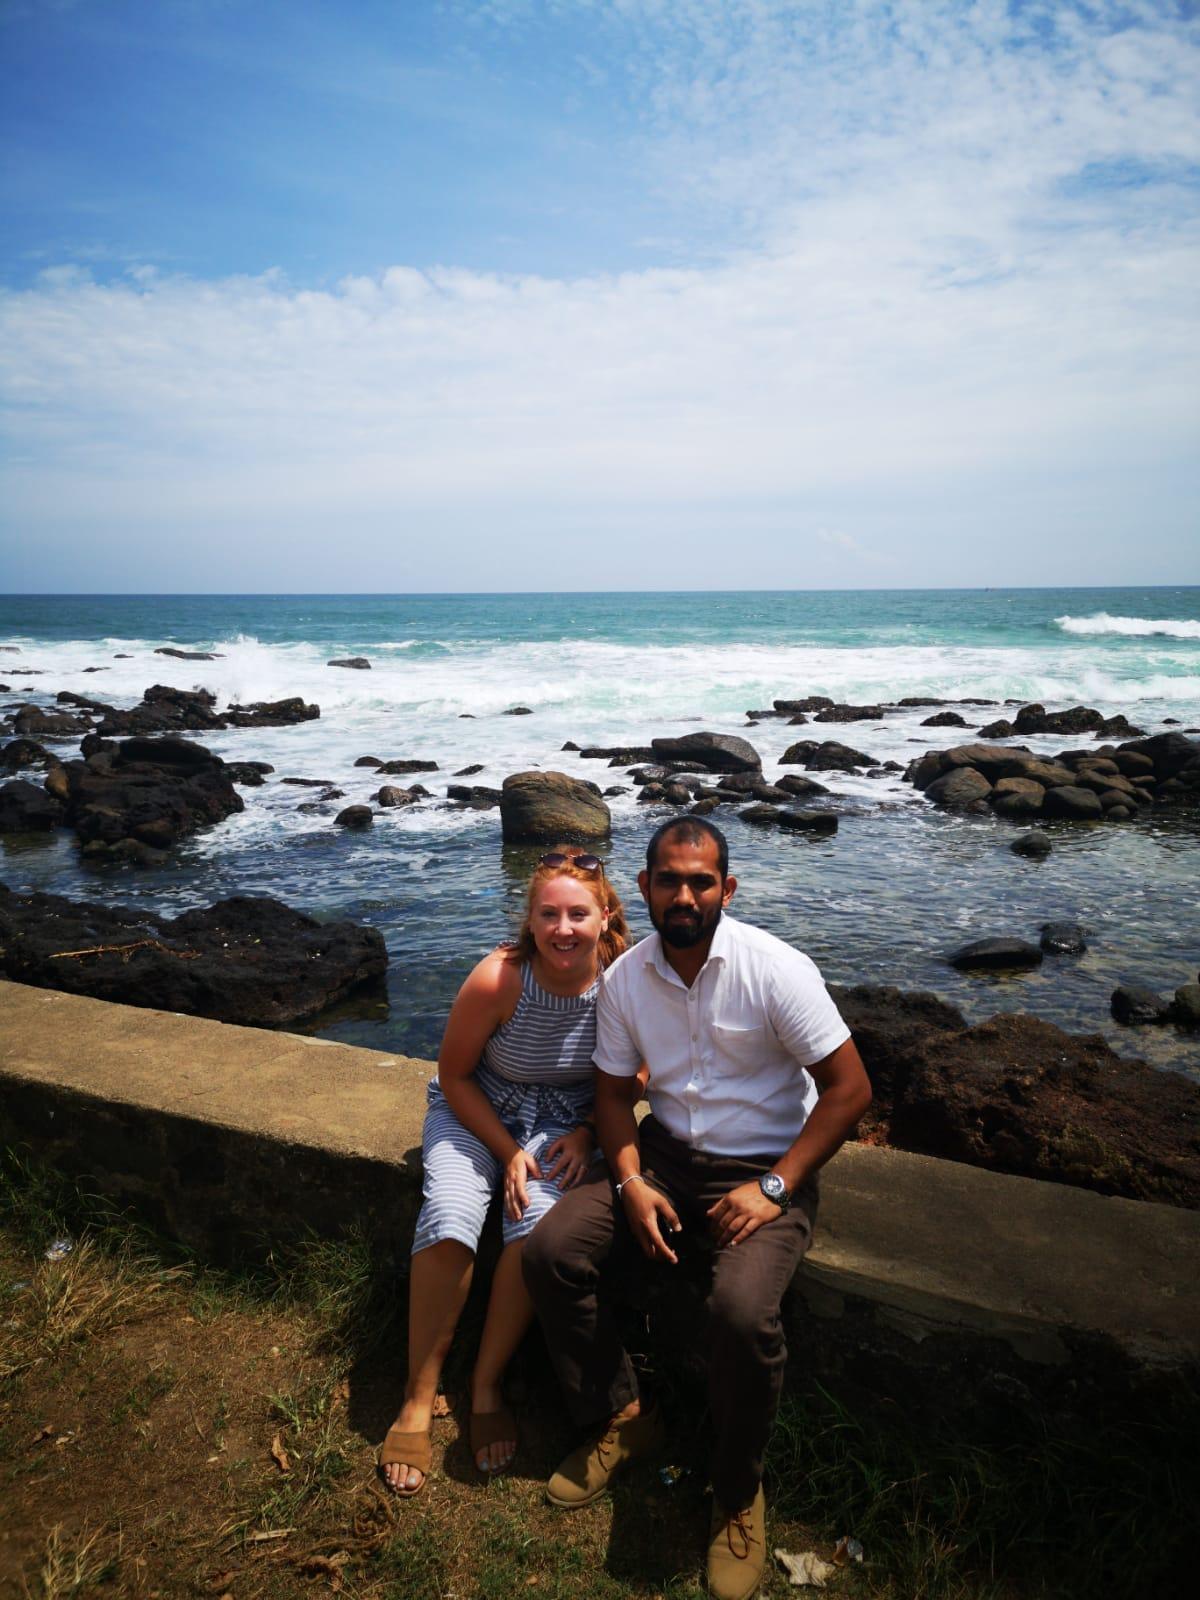 invite-to-paradise-sri-lanka-holiday-honeymoon-specialists-customer-feedback-elin-jordan-luce-chauffeur-guide-ruchira-galle-ocean.JPG